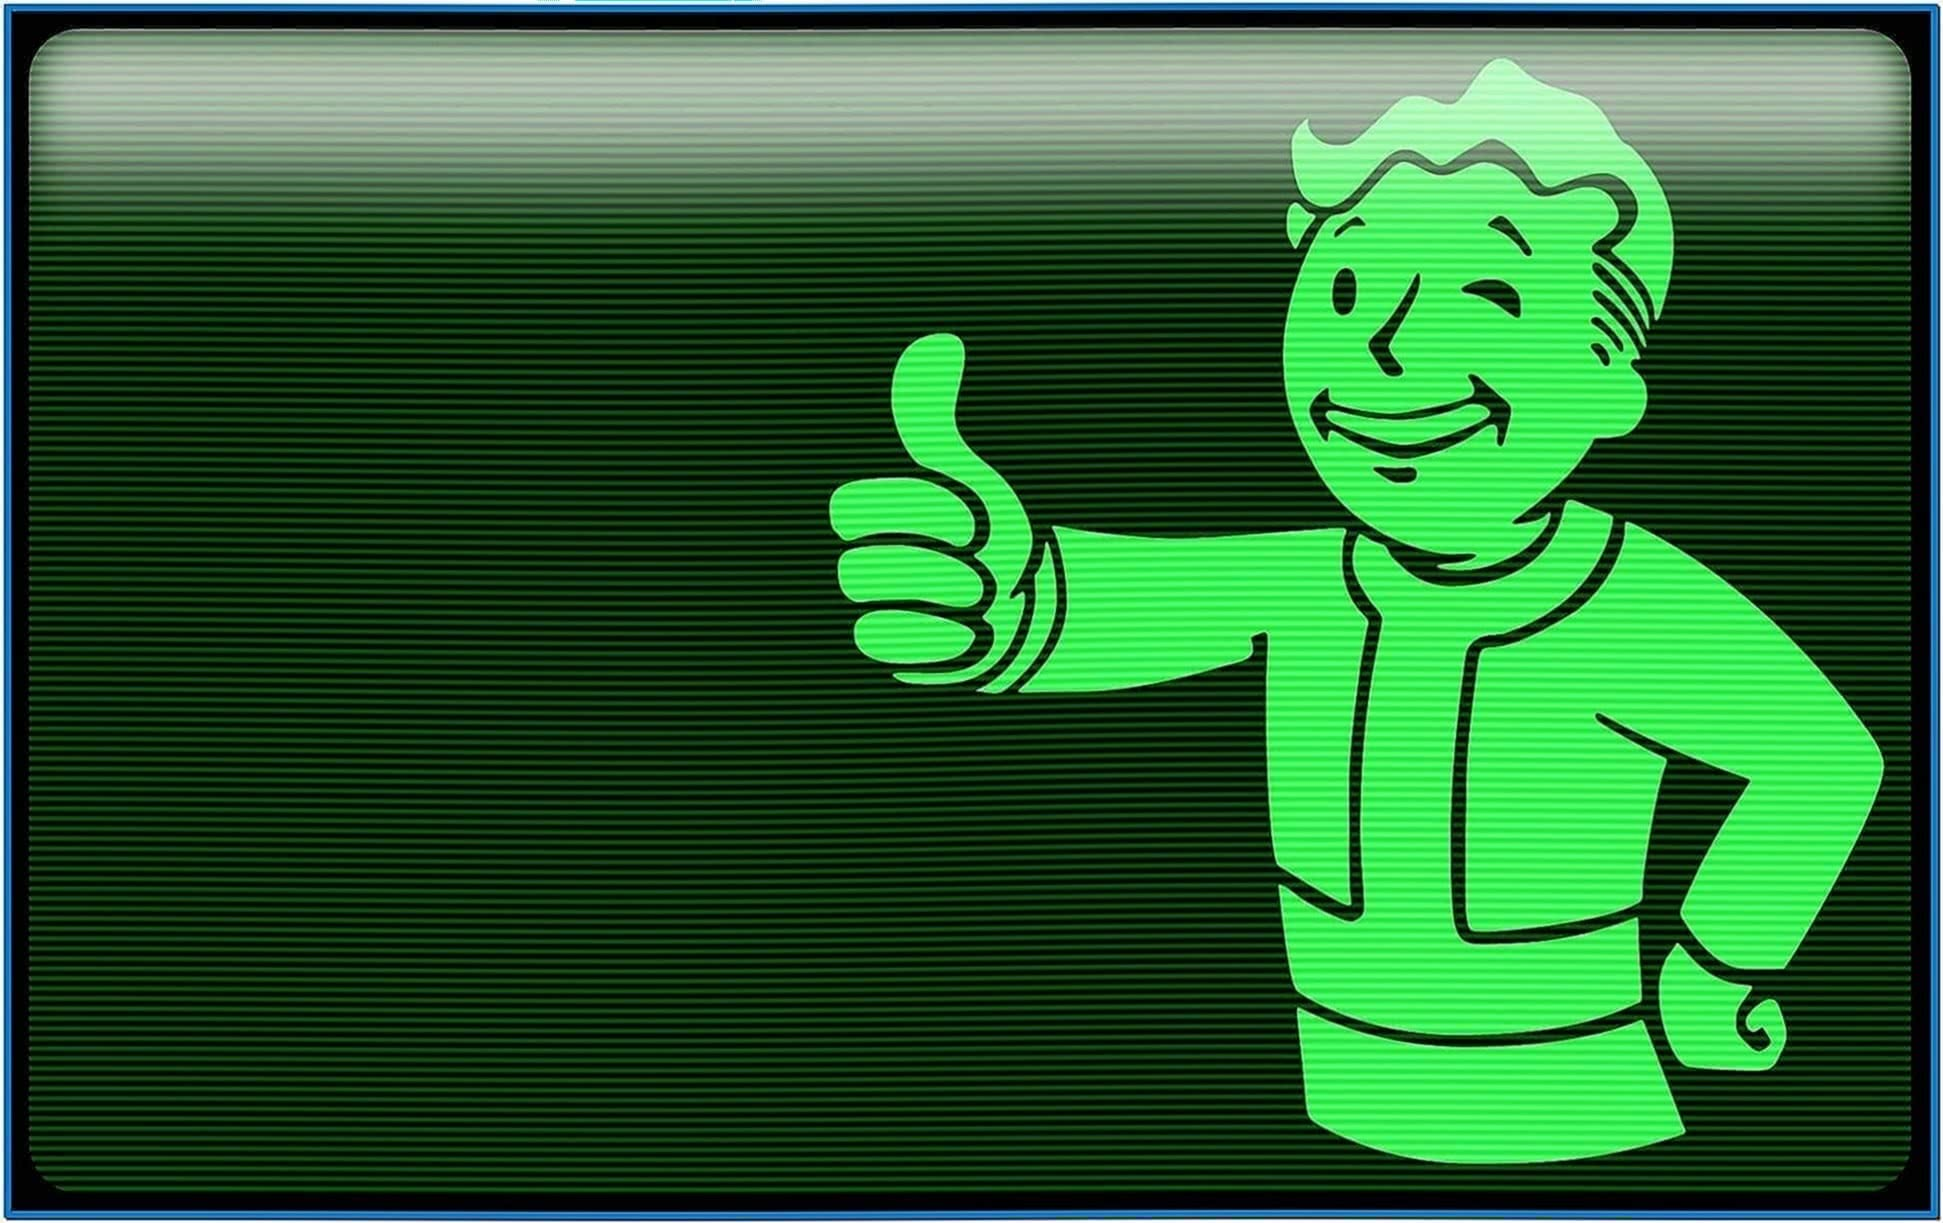 Fallout 2 Pip Boy Screensaver - Download-Screensavers.biz